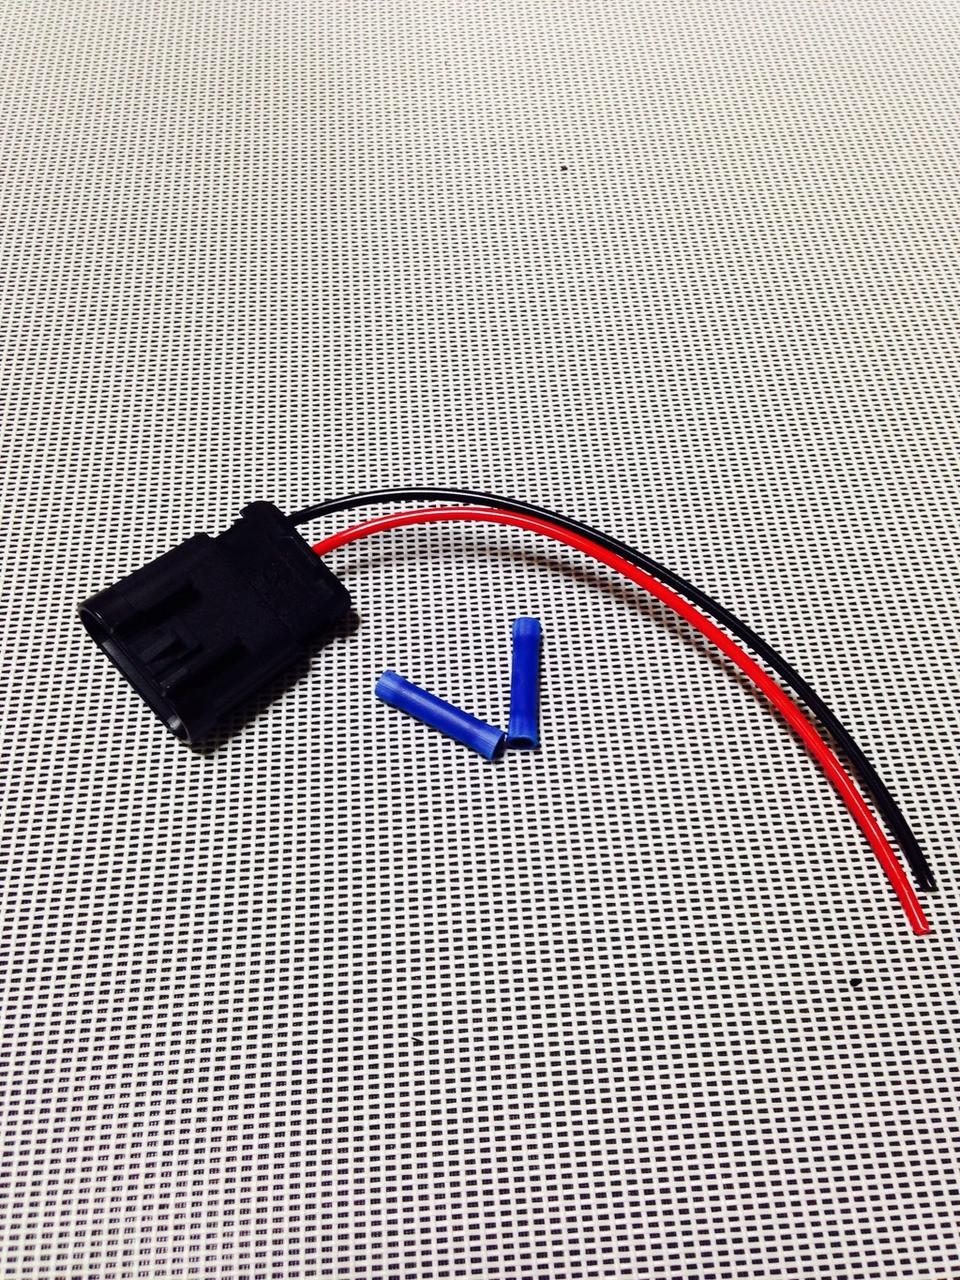 xm chassis led wiring harness plug kit price 25 00 image 1 [ 960 x 1280 Pixel ]